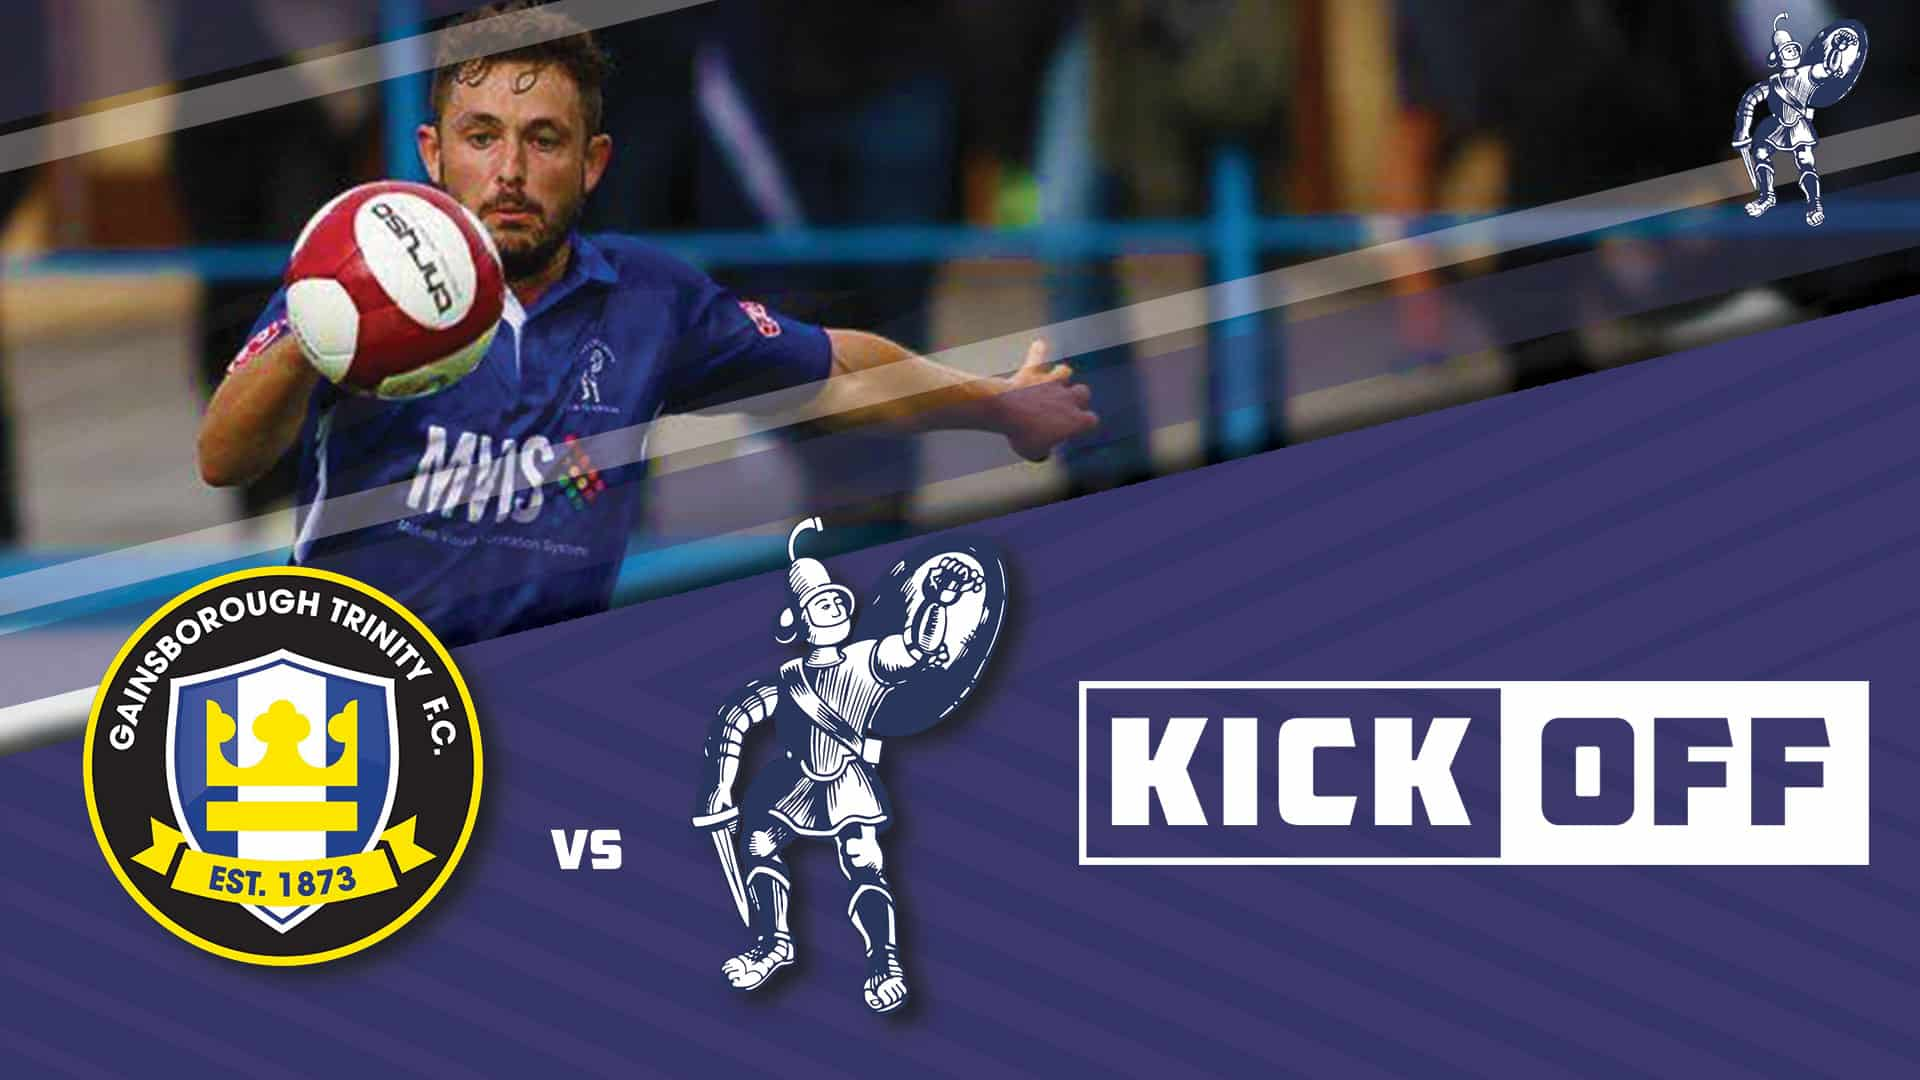 kick off Matlock Town FC